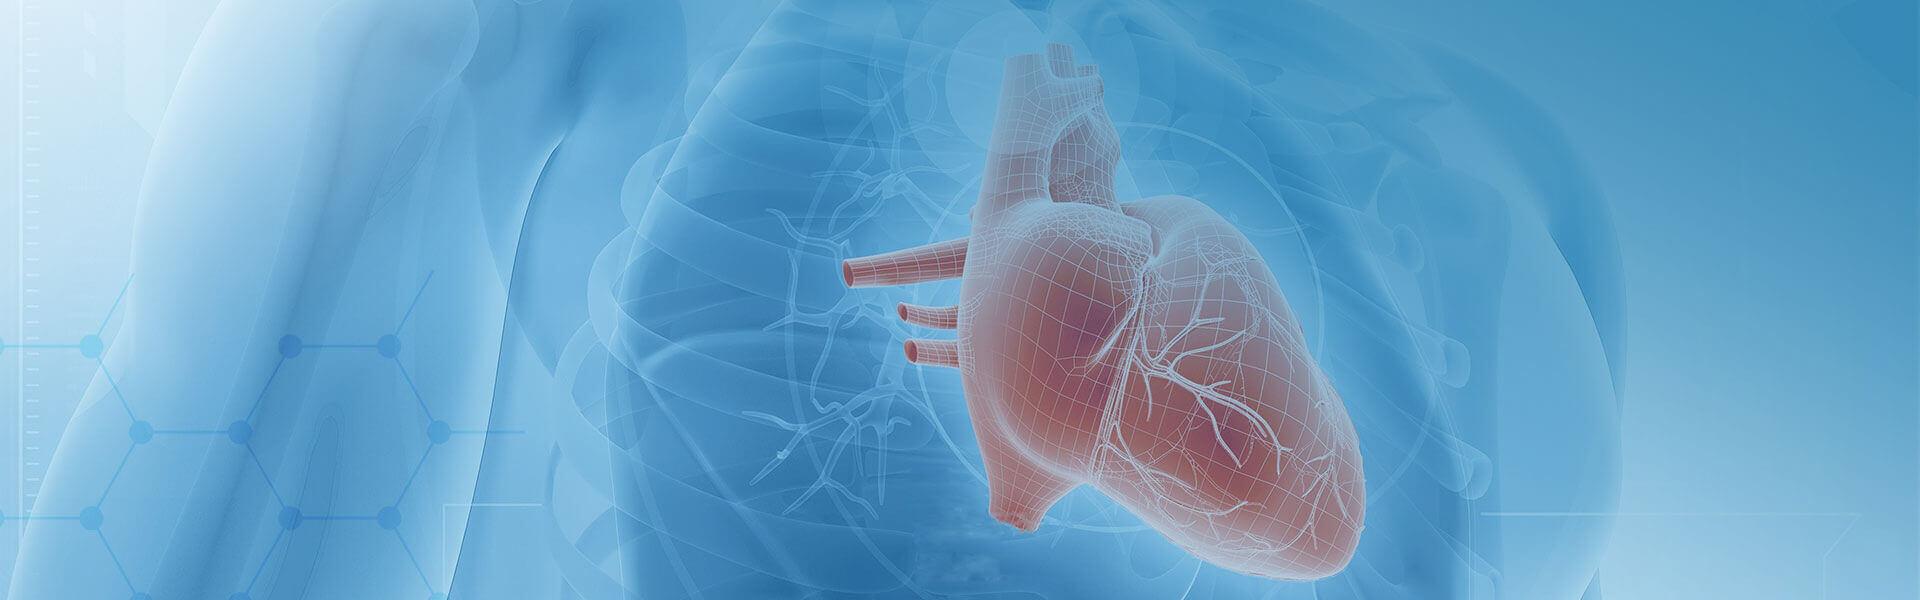 Cardiovascular